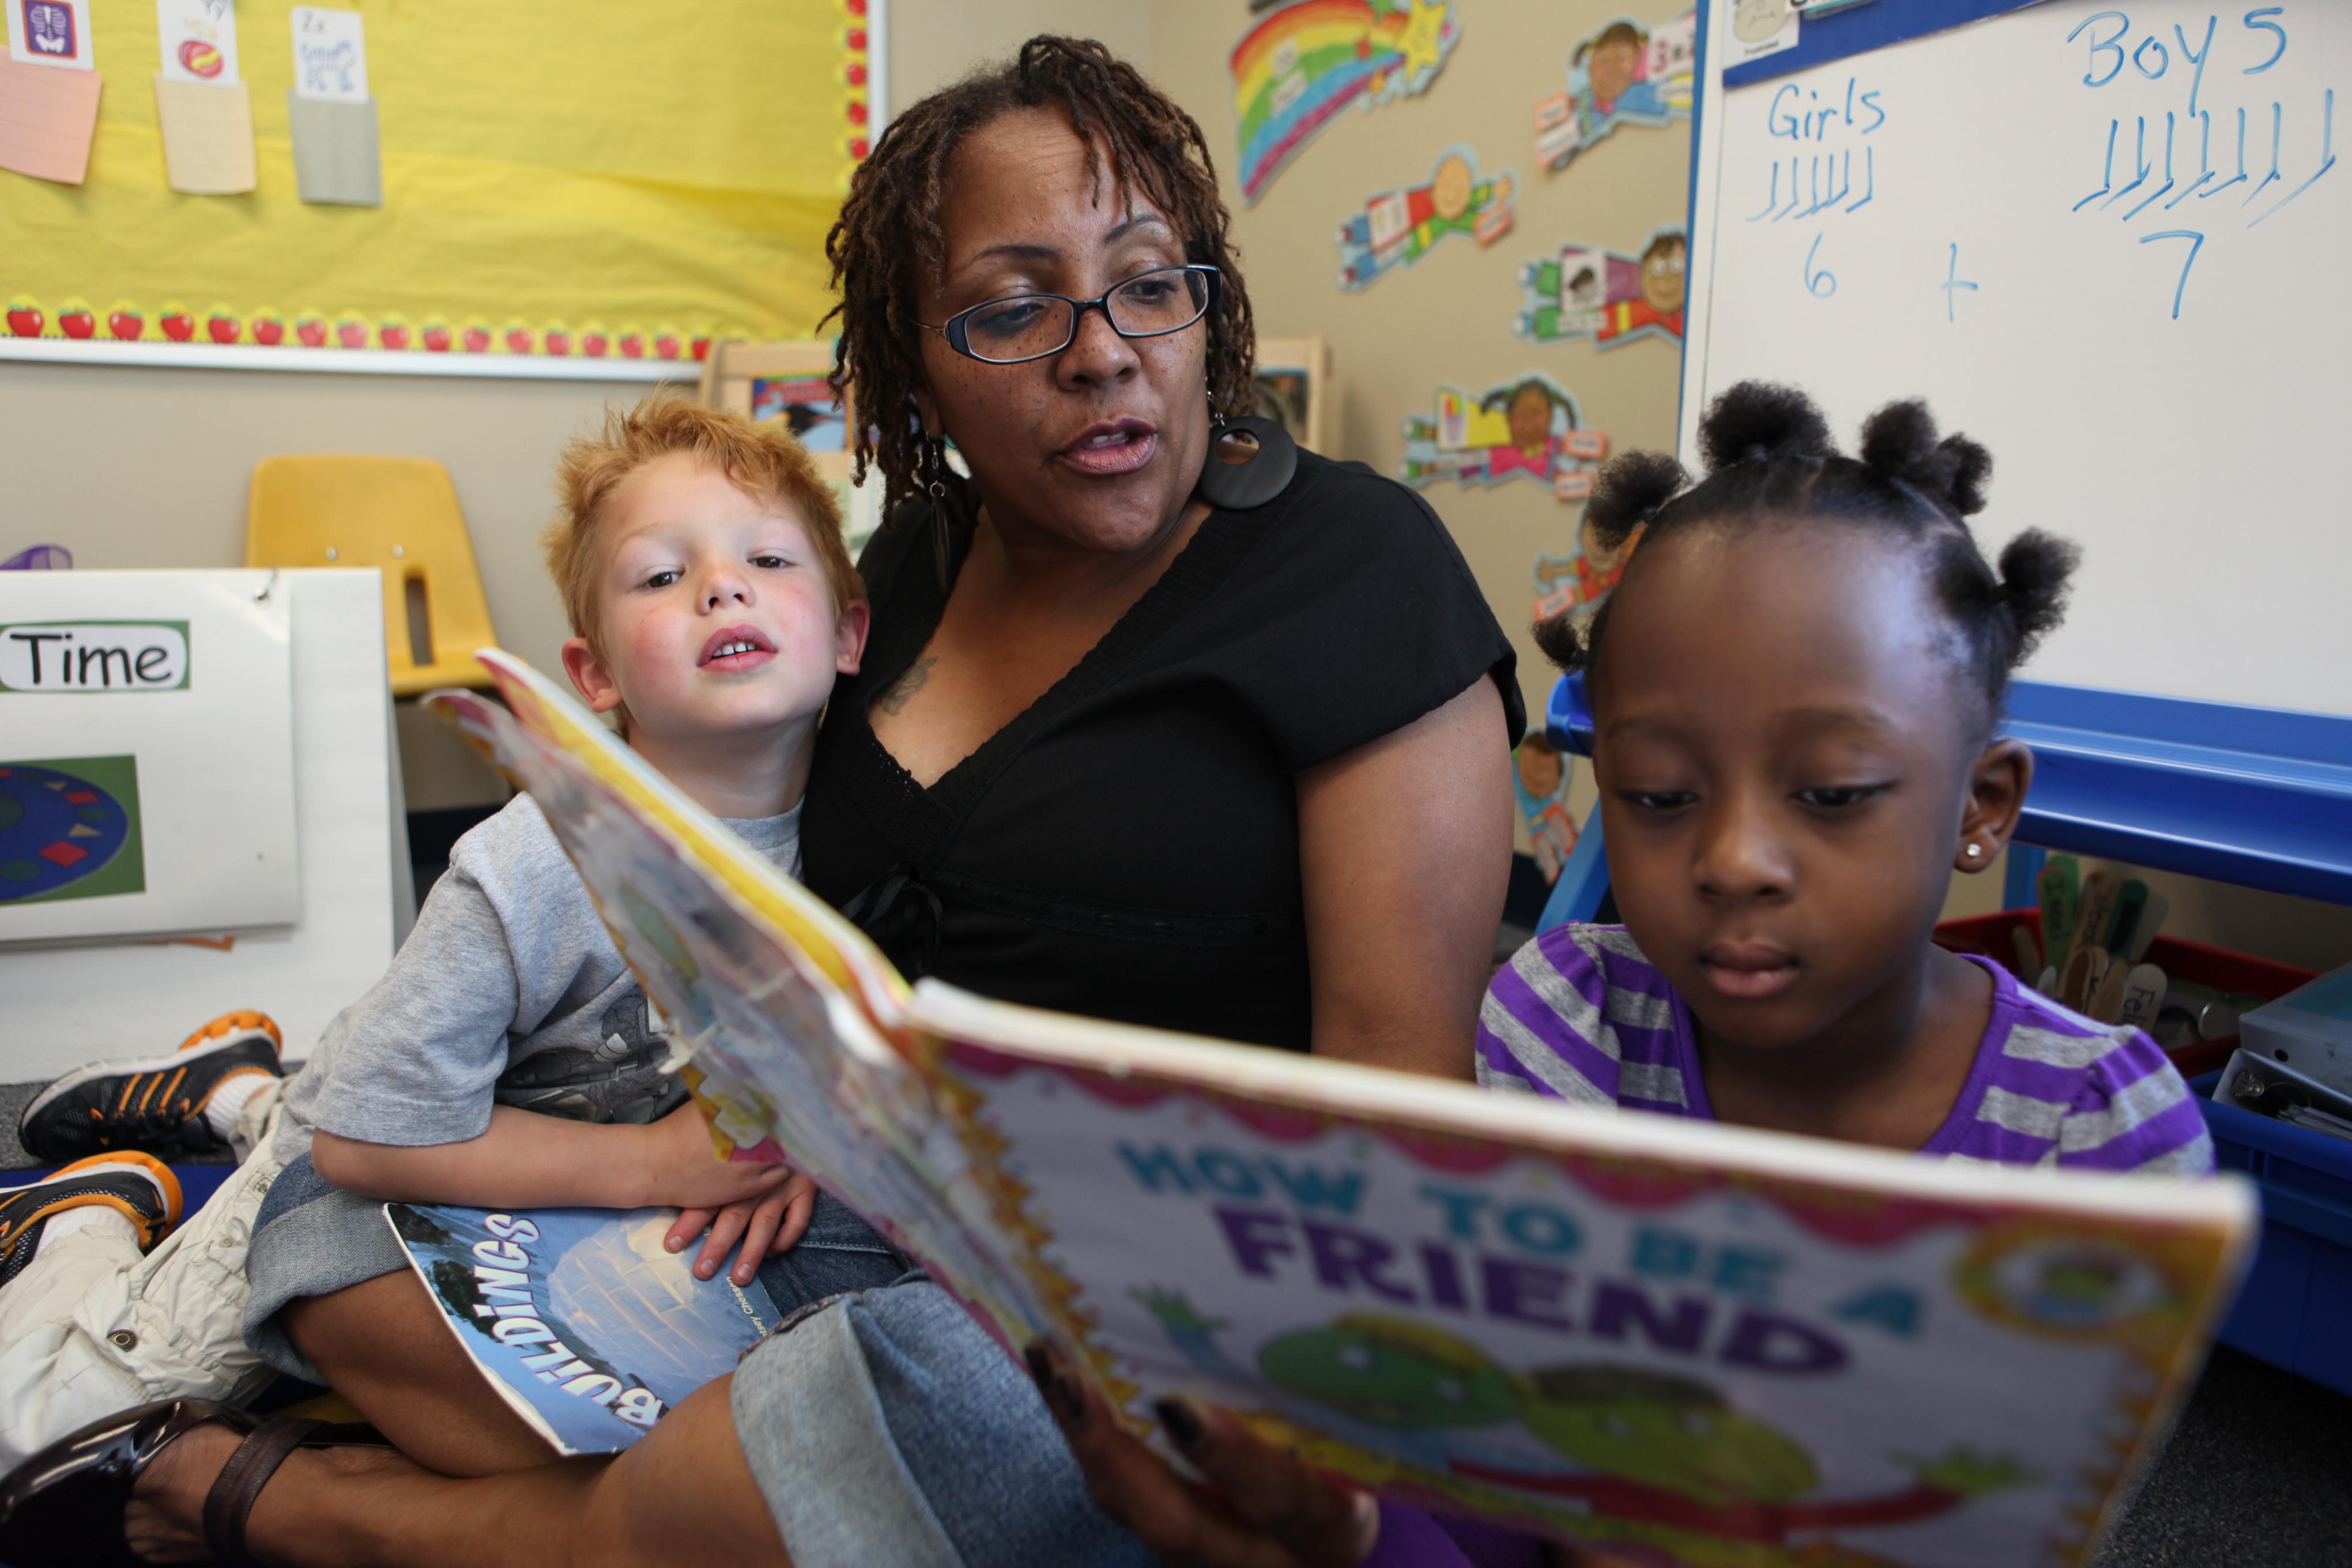 Ability Connection Colorado students practice reading. Photos courtesy of ACCO.